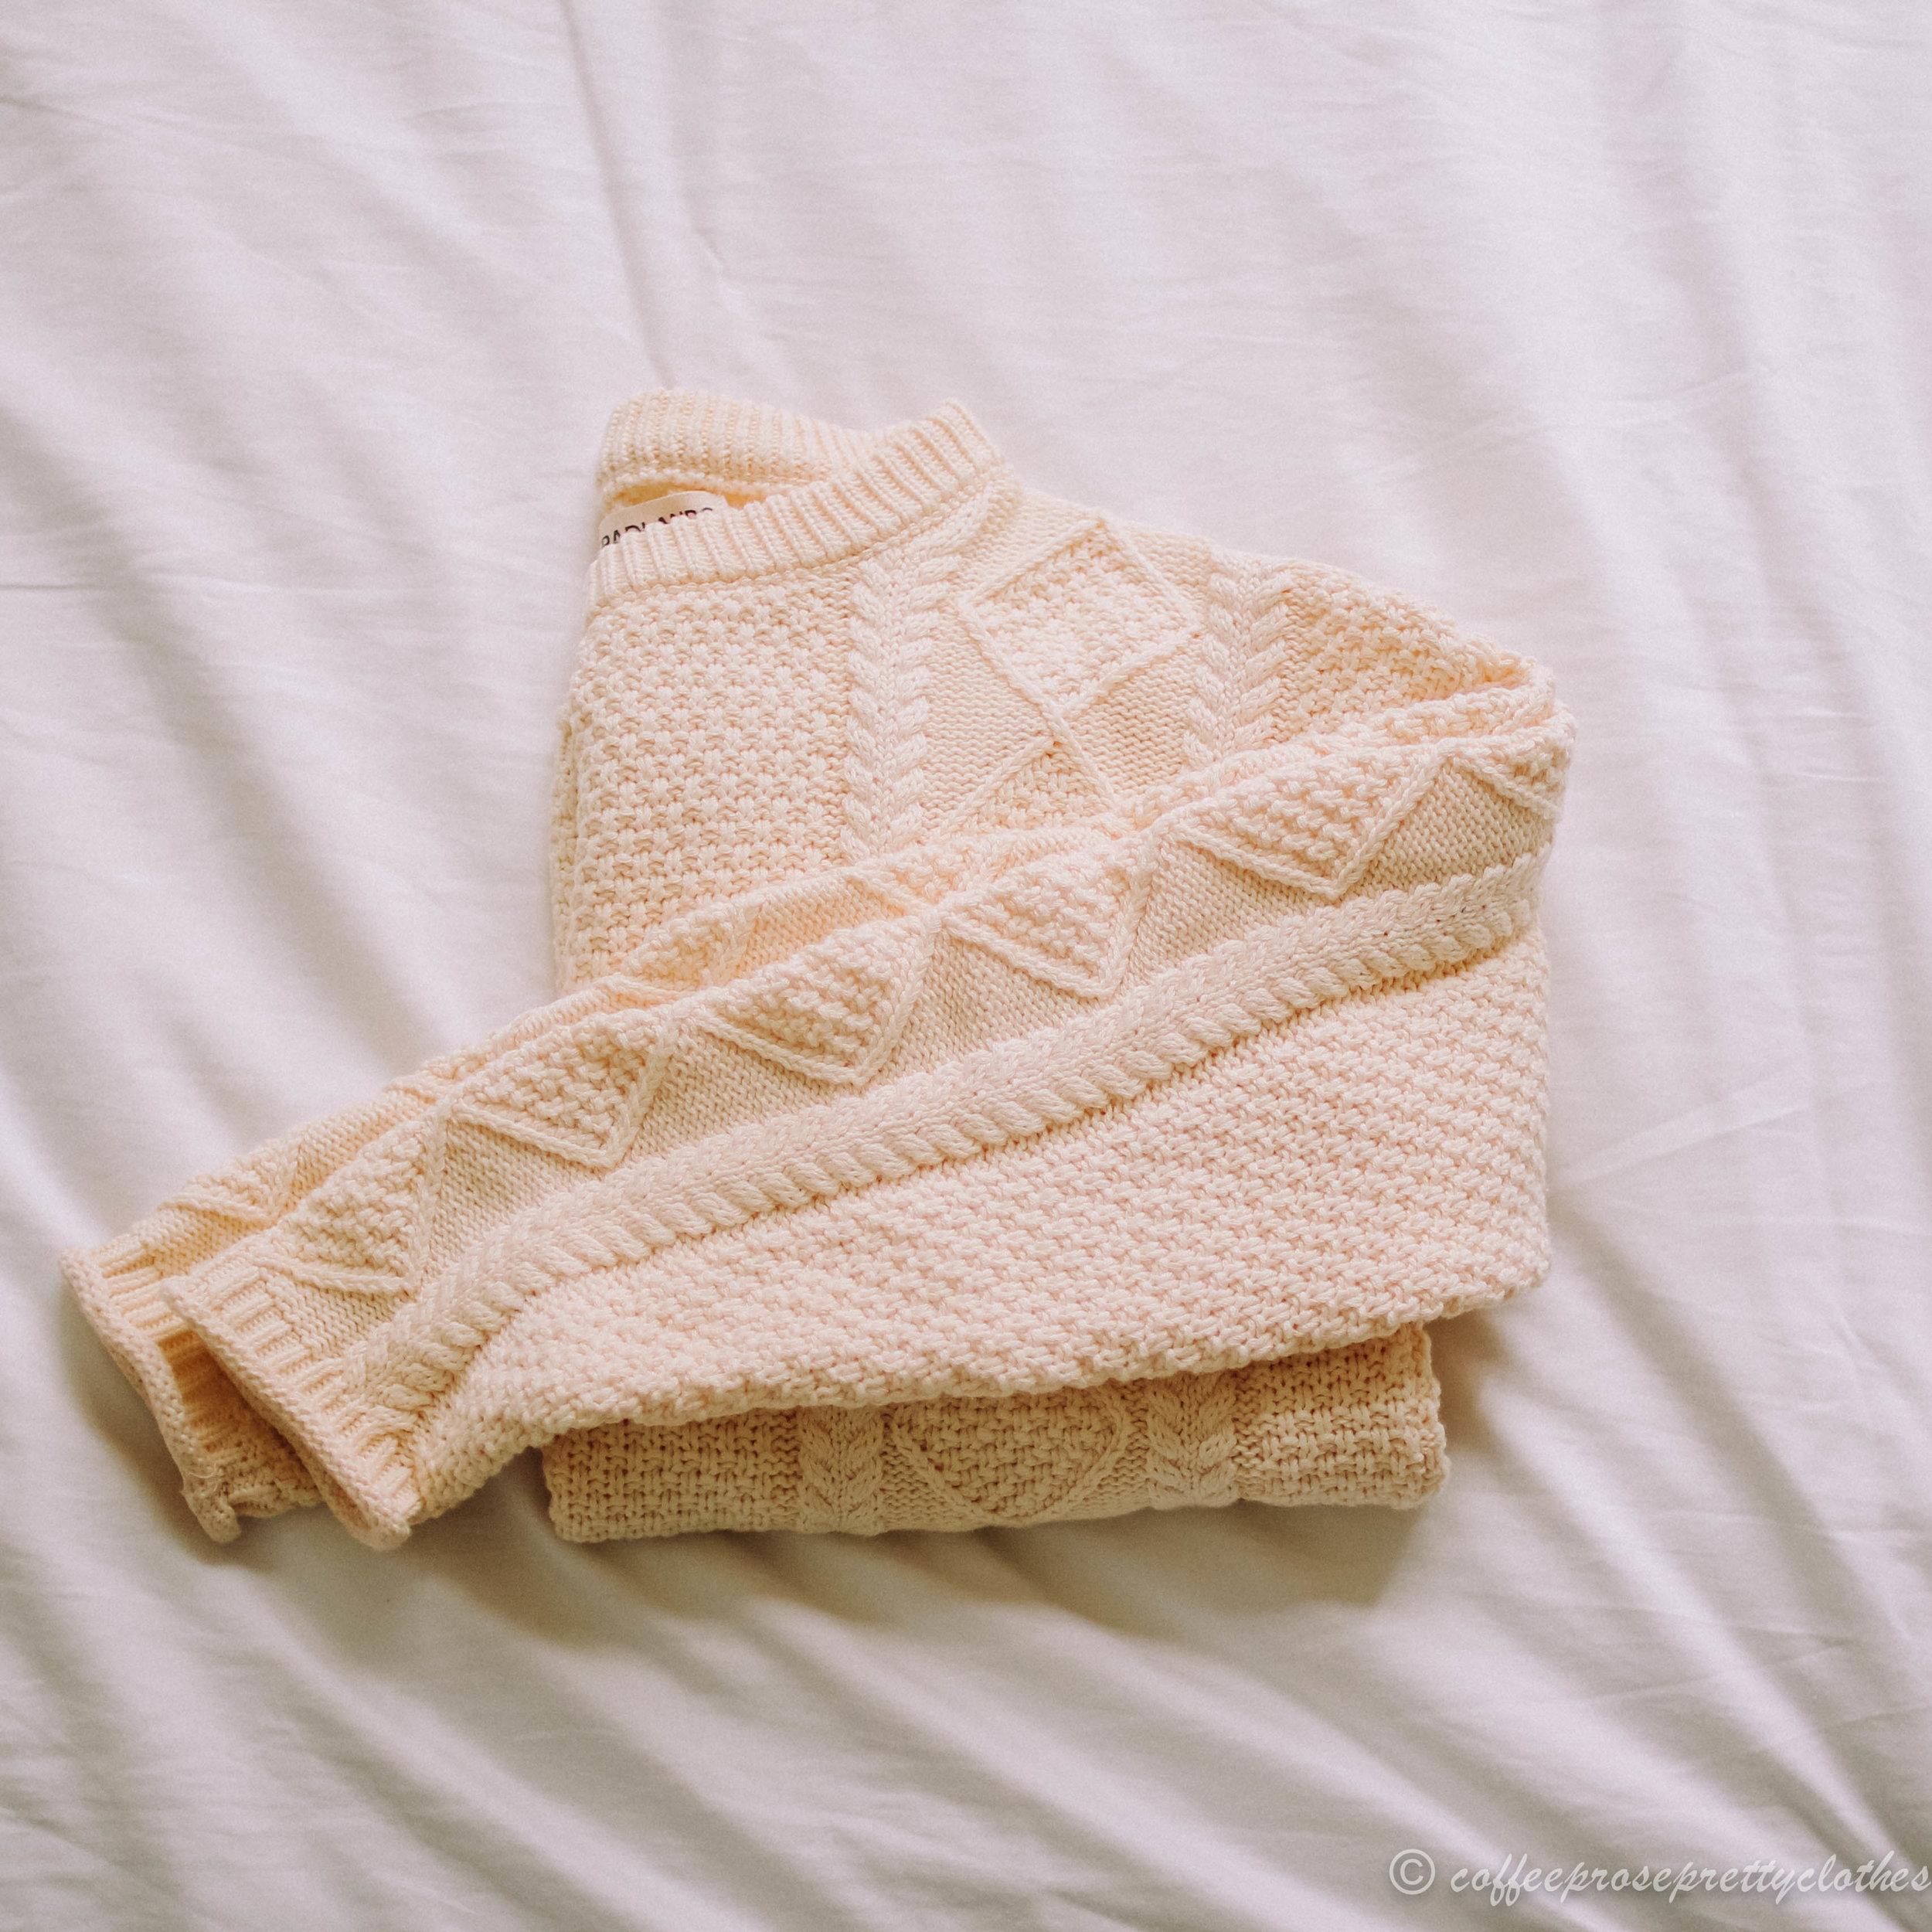 Trandlands Fisher's Sweater